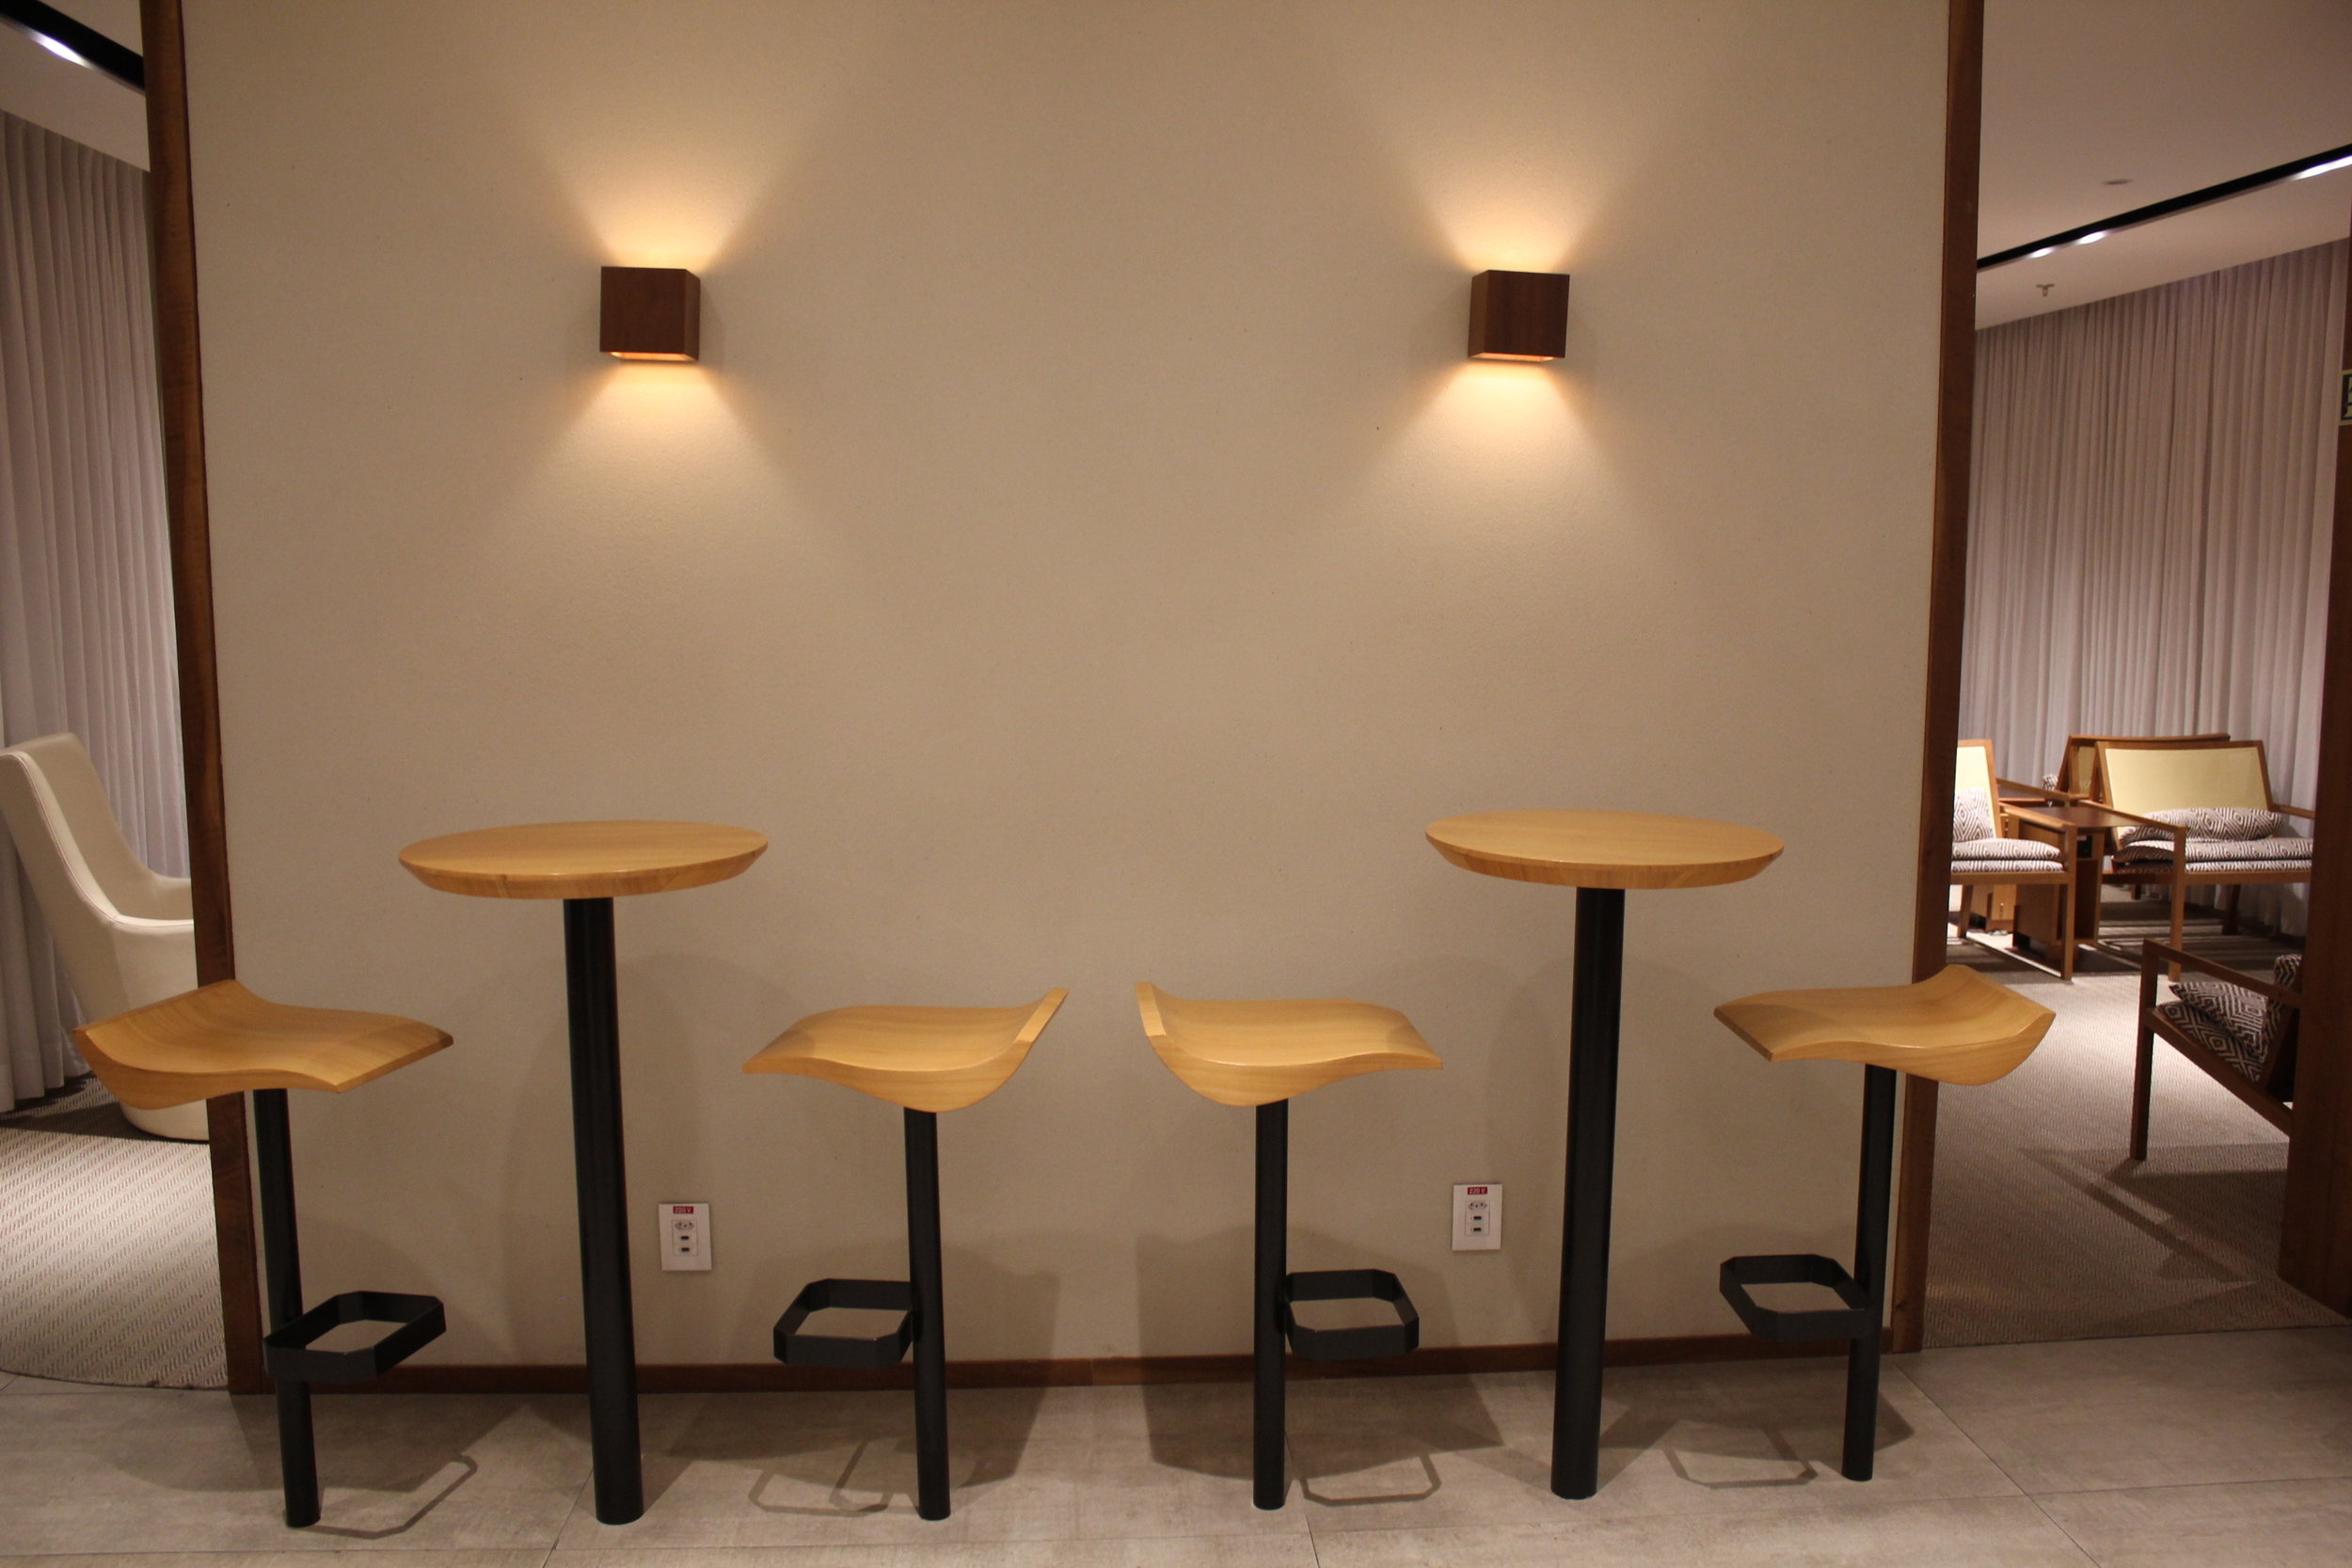 Star Alliance Lounge Rio de Janeiro – Bar seats